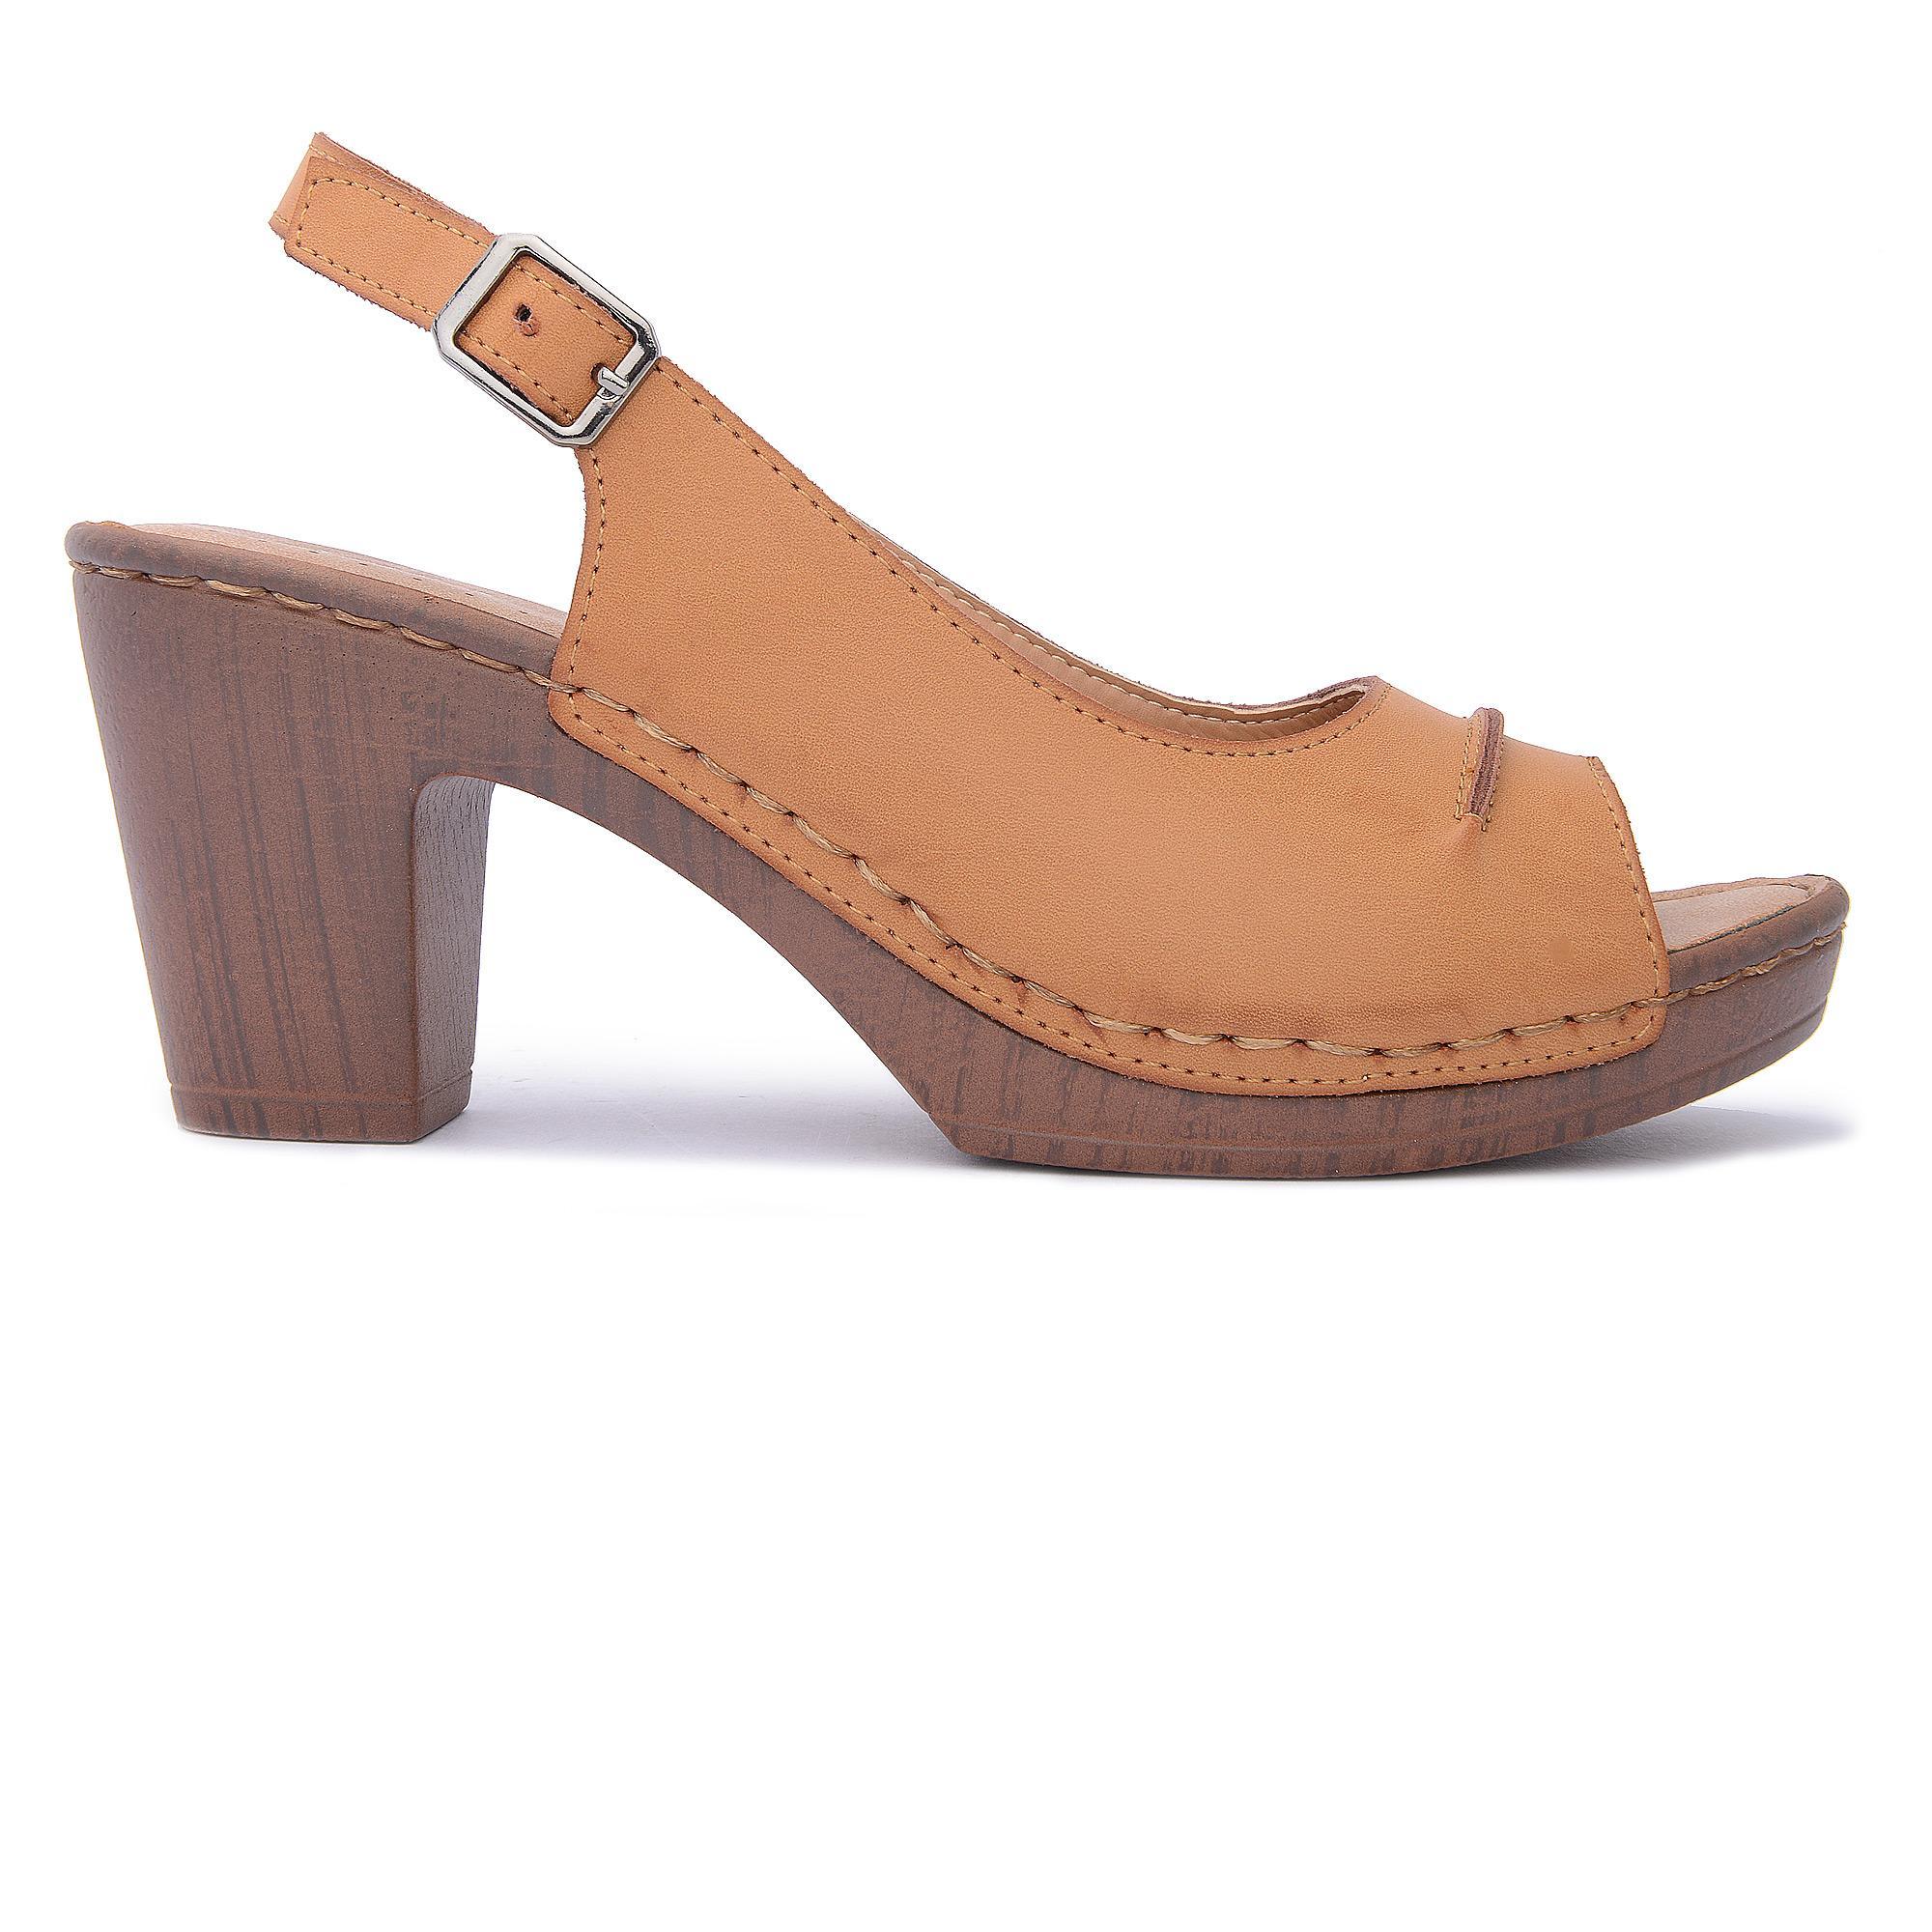 Bata Ladies Slingback Heels 7514708 By Bata.